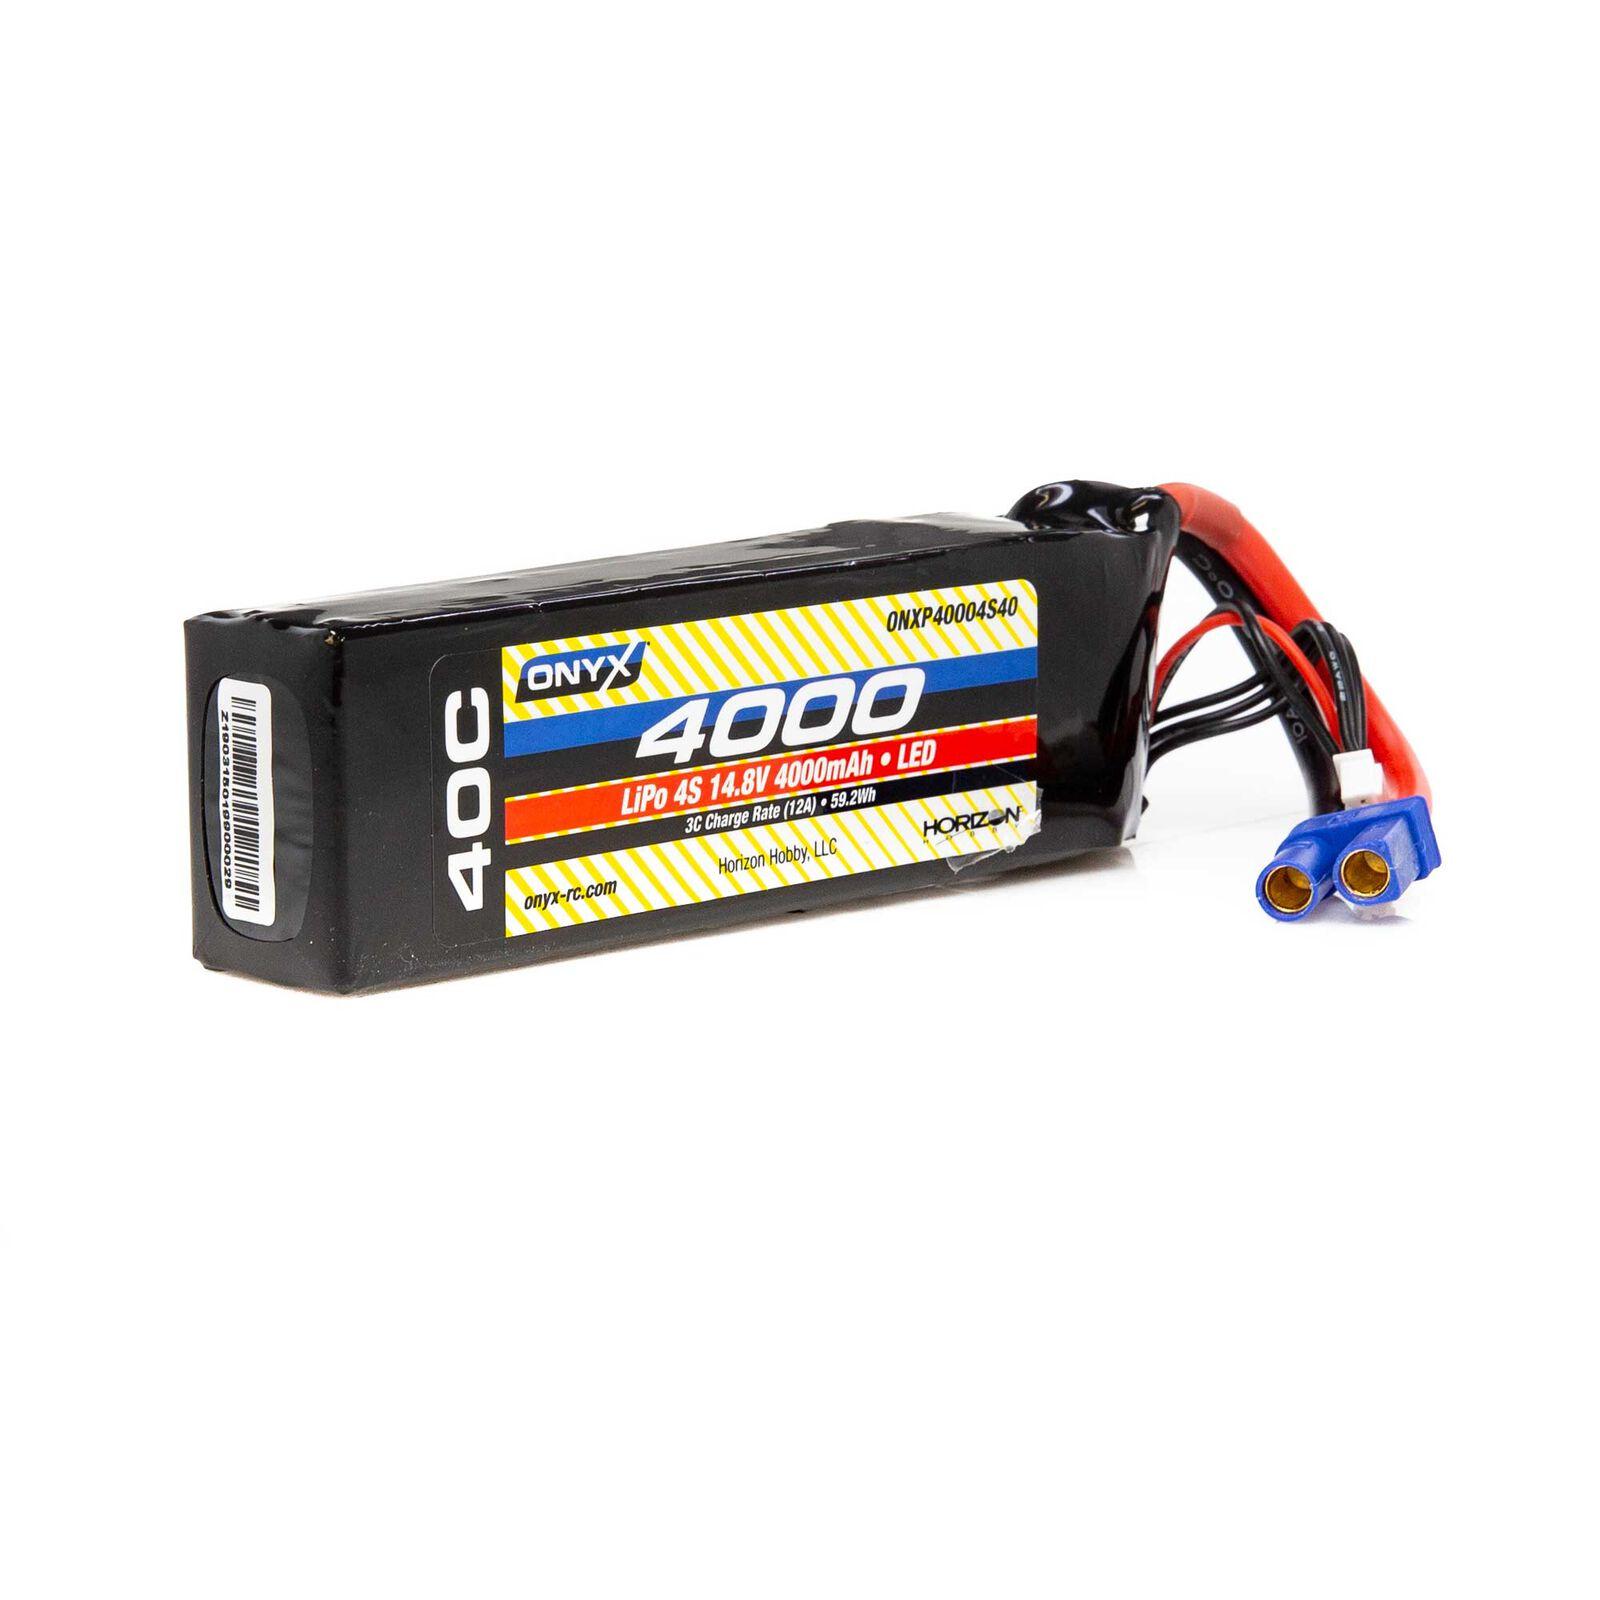 14.8V 4000mAh 4S 40C LiPo Battery: EC5